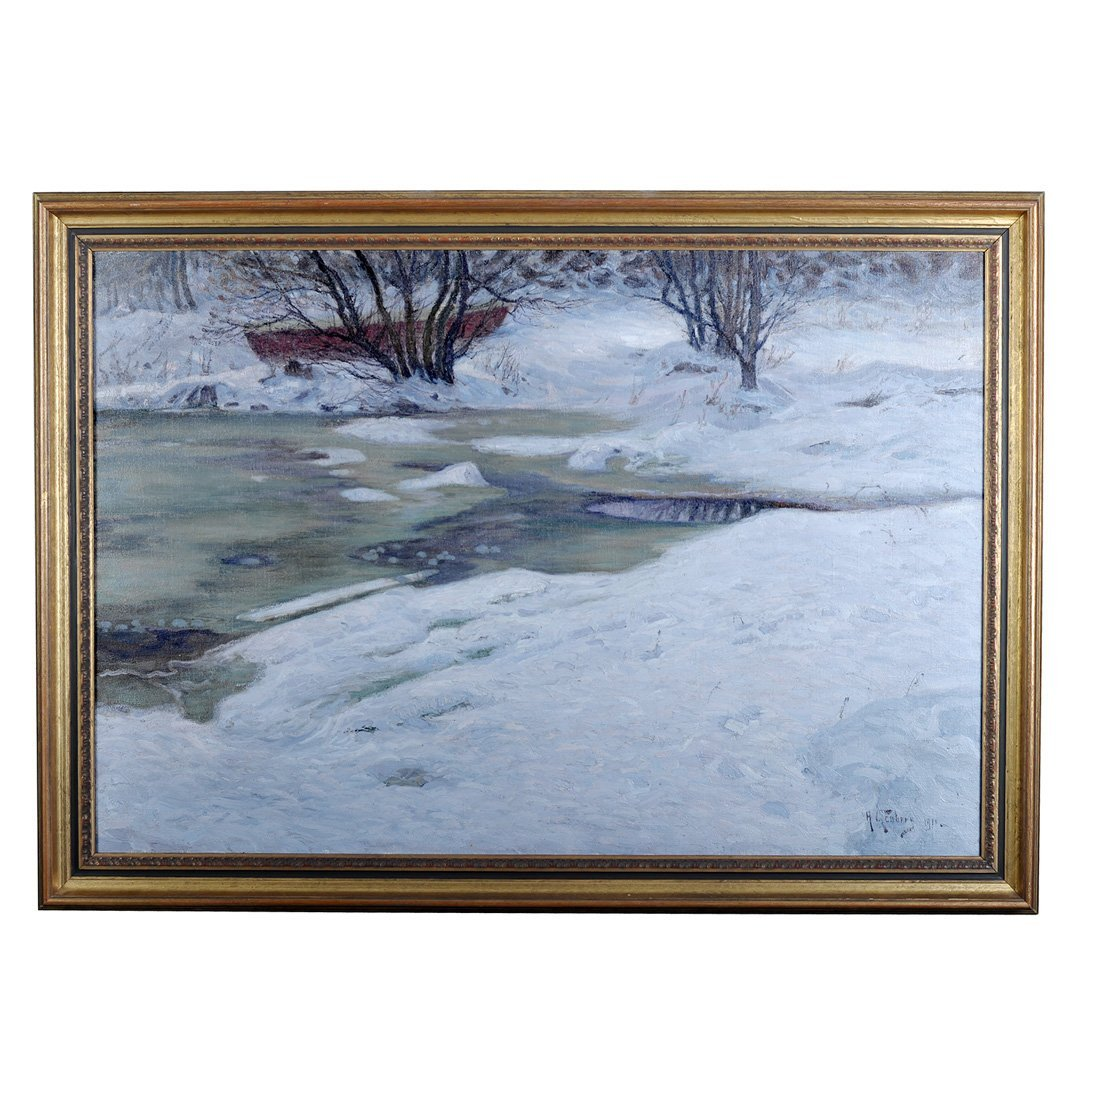 16: ANTON GENBERG (1862-1939), olja på duk